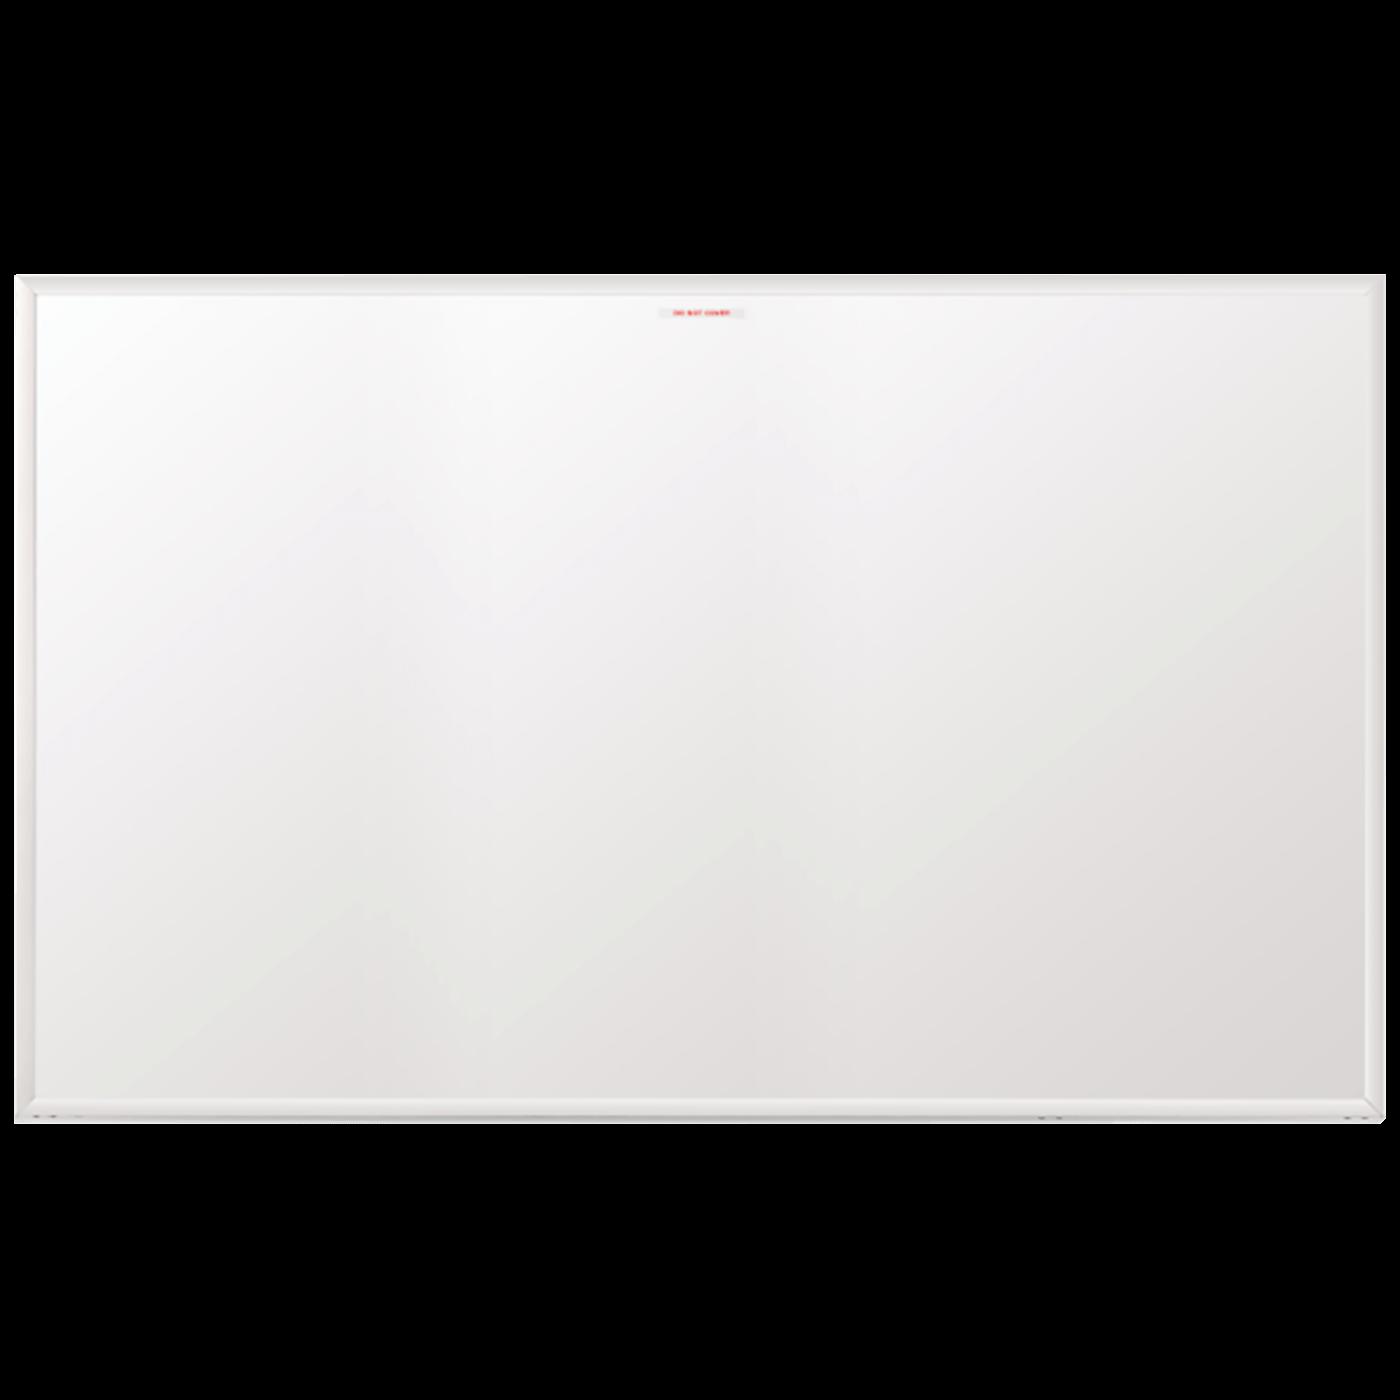 Panel električna grijalica, smart, 700 W, WiFi